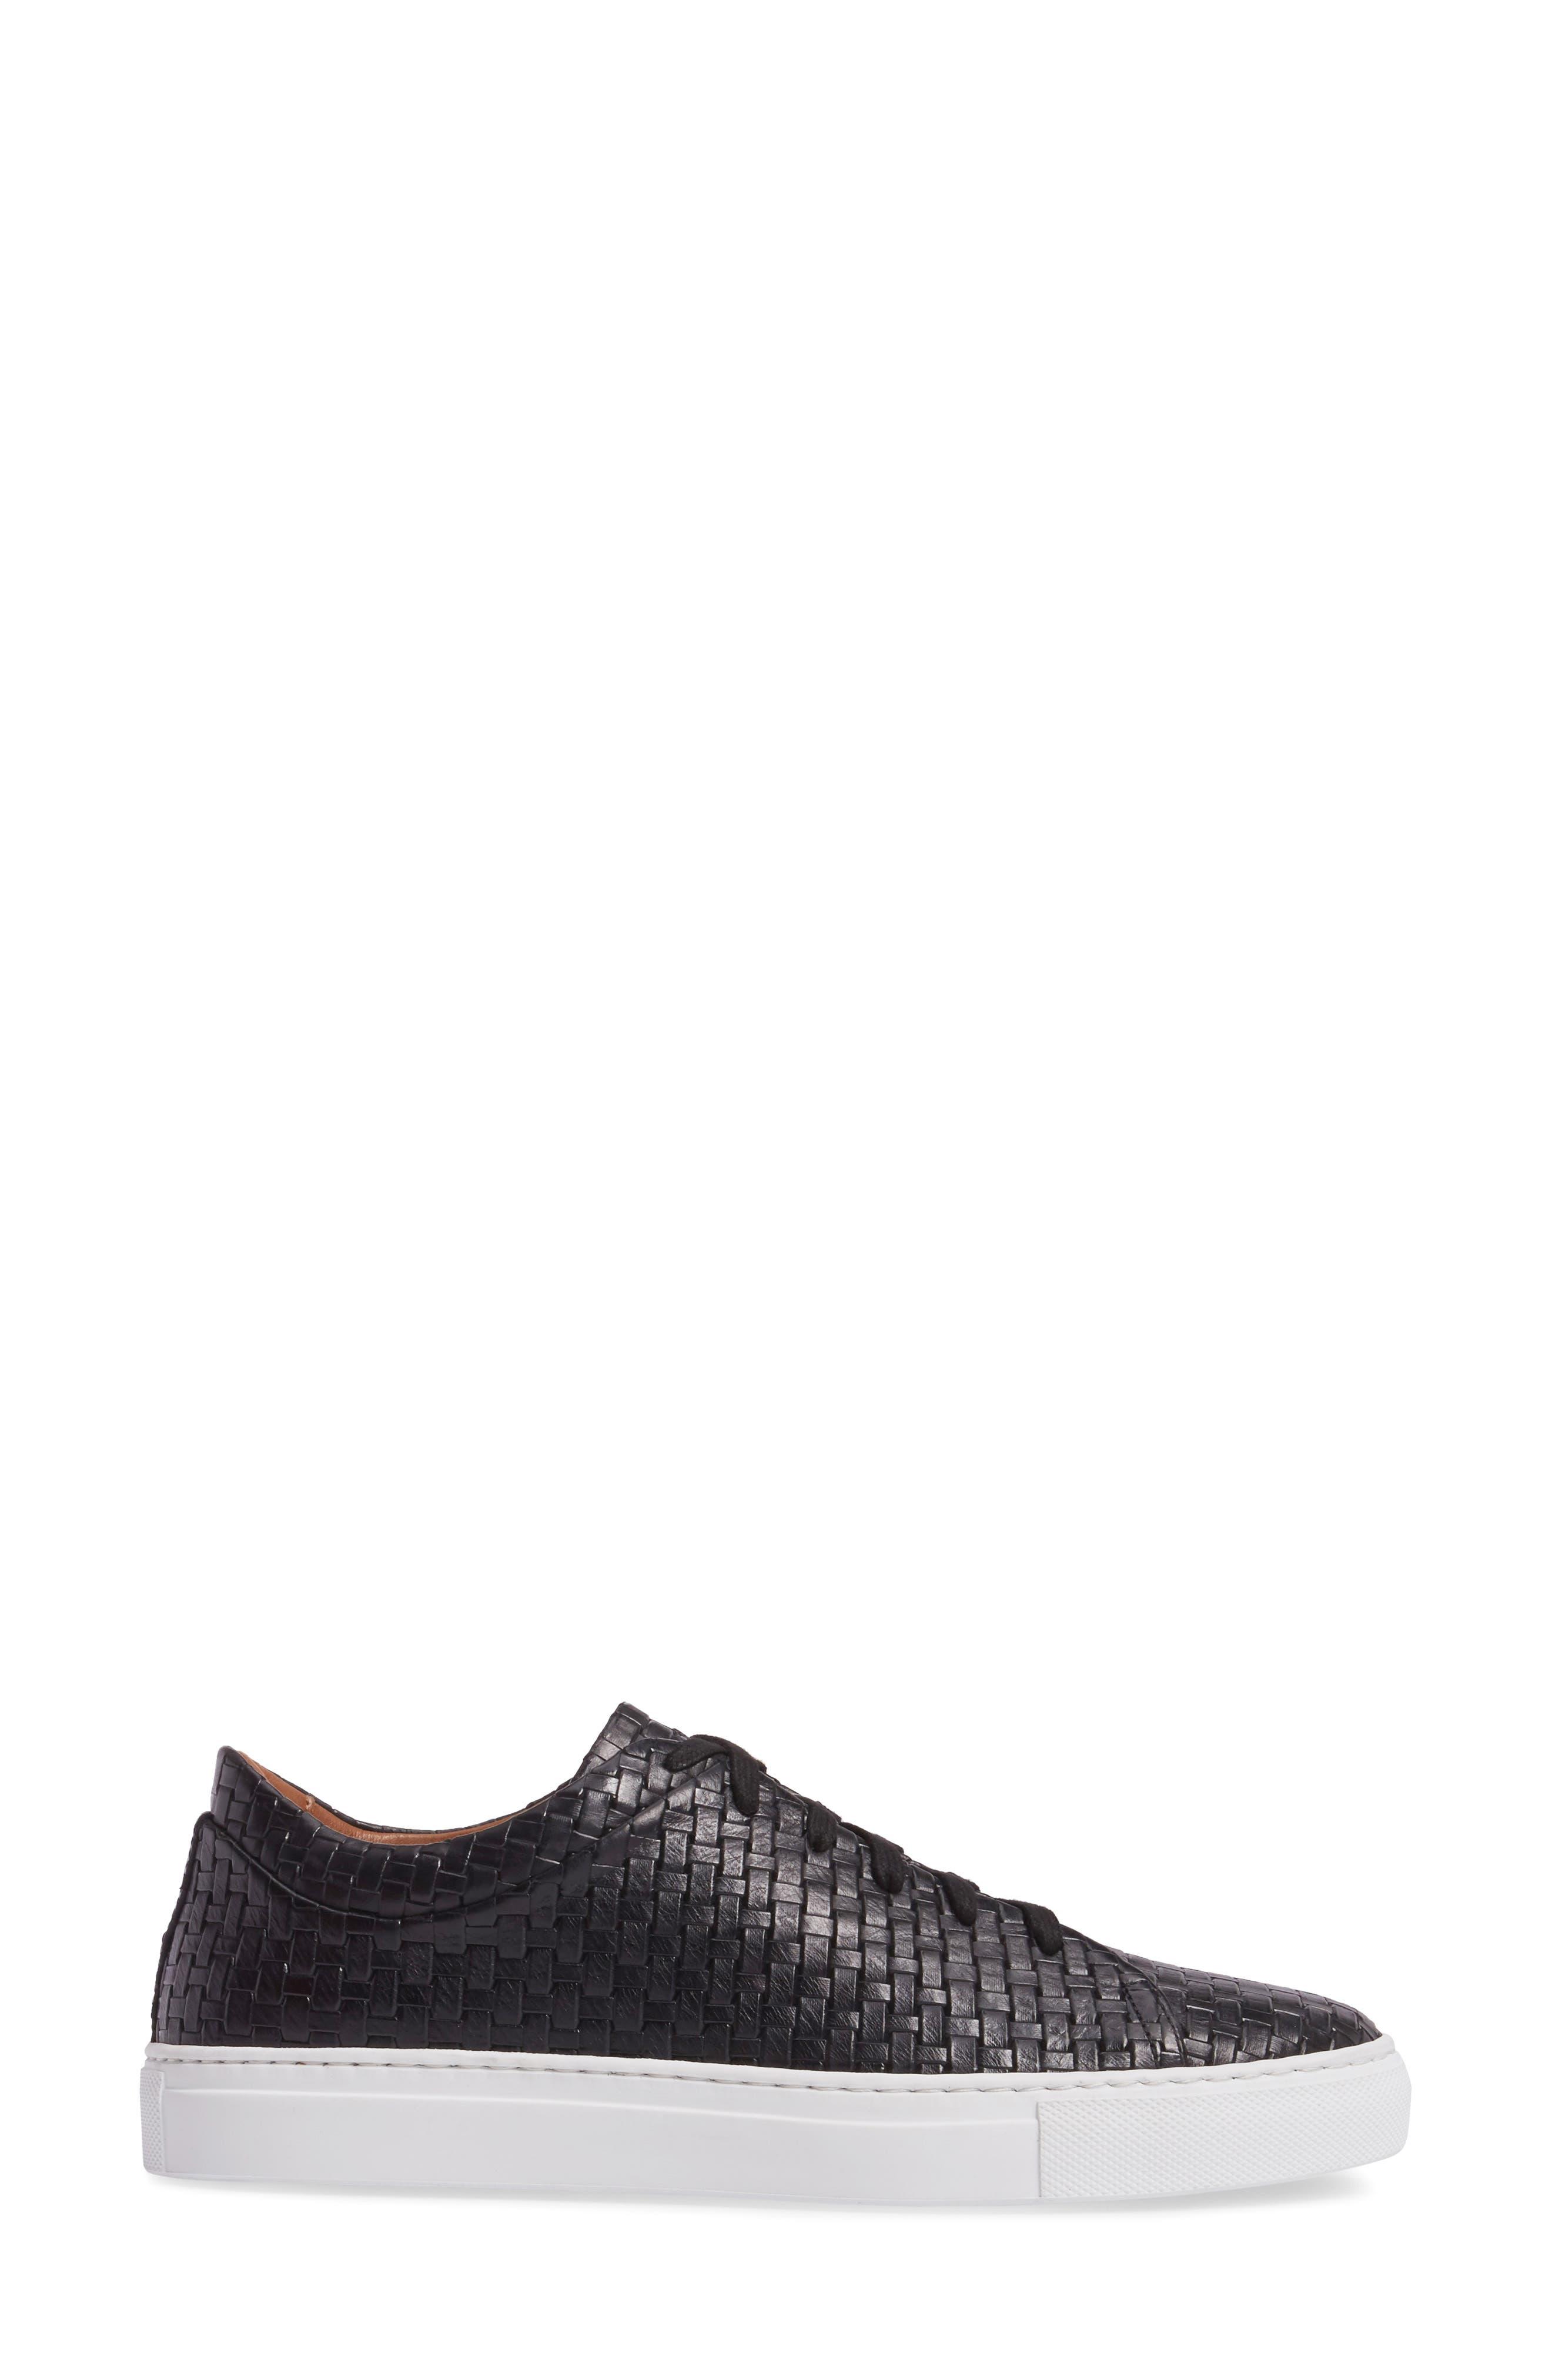 Avery Weatherproof Sneaker,                             Alternate thumbnail 3, color,                             BLACK